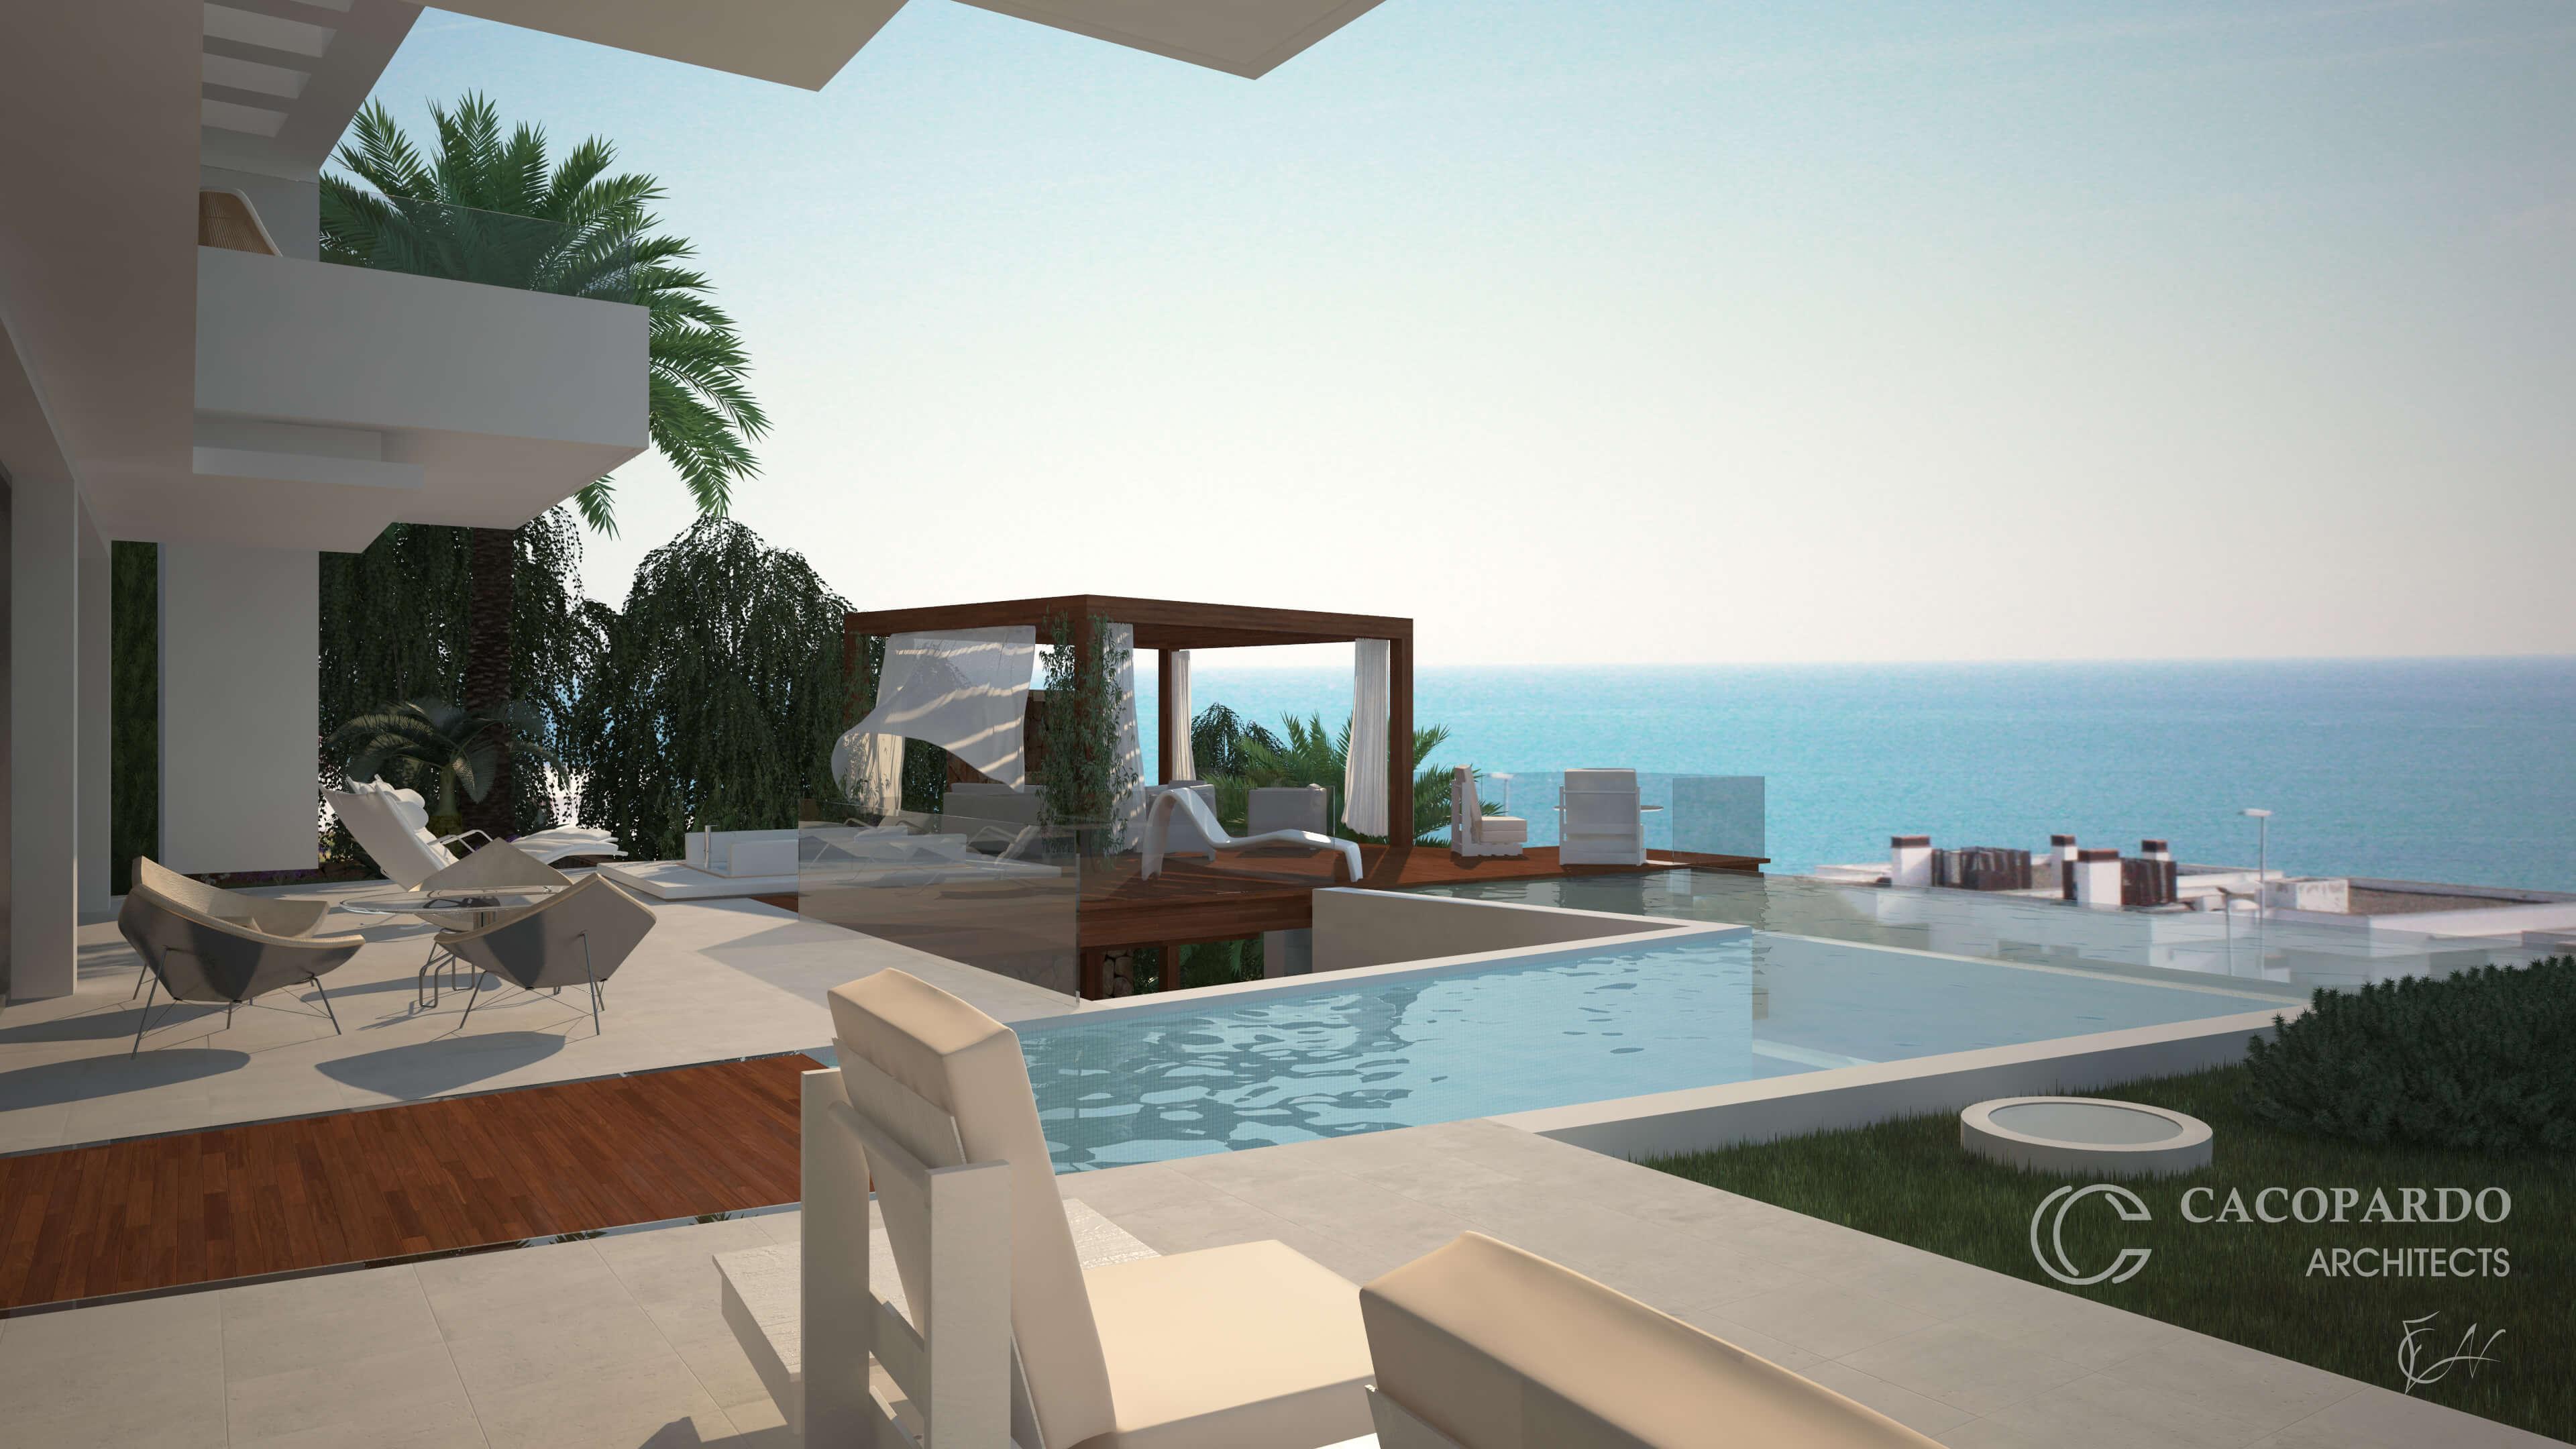 Vista desde el porche-Infinitum House- Costa del Sol